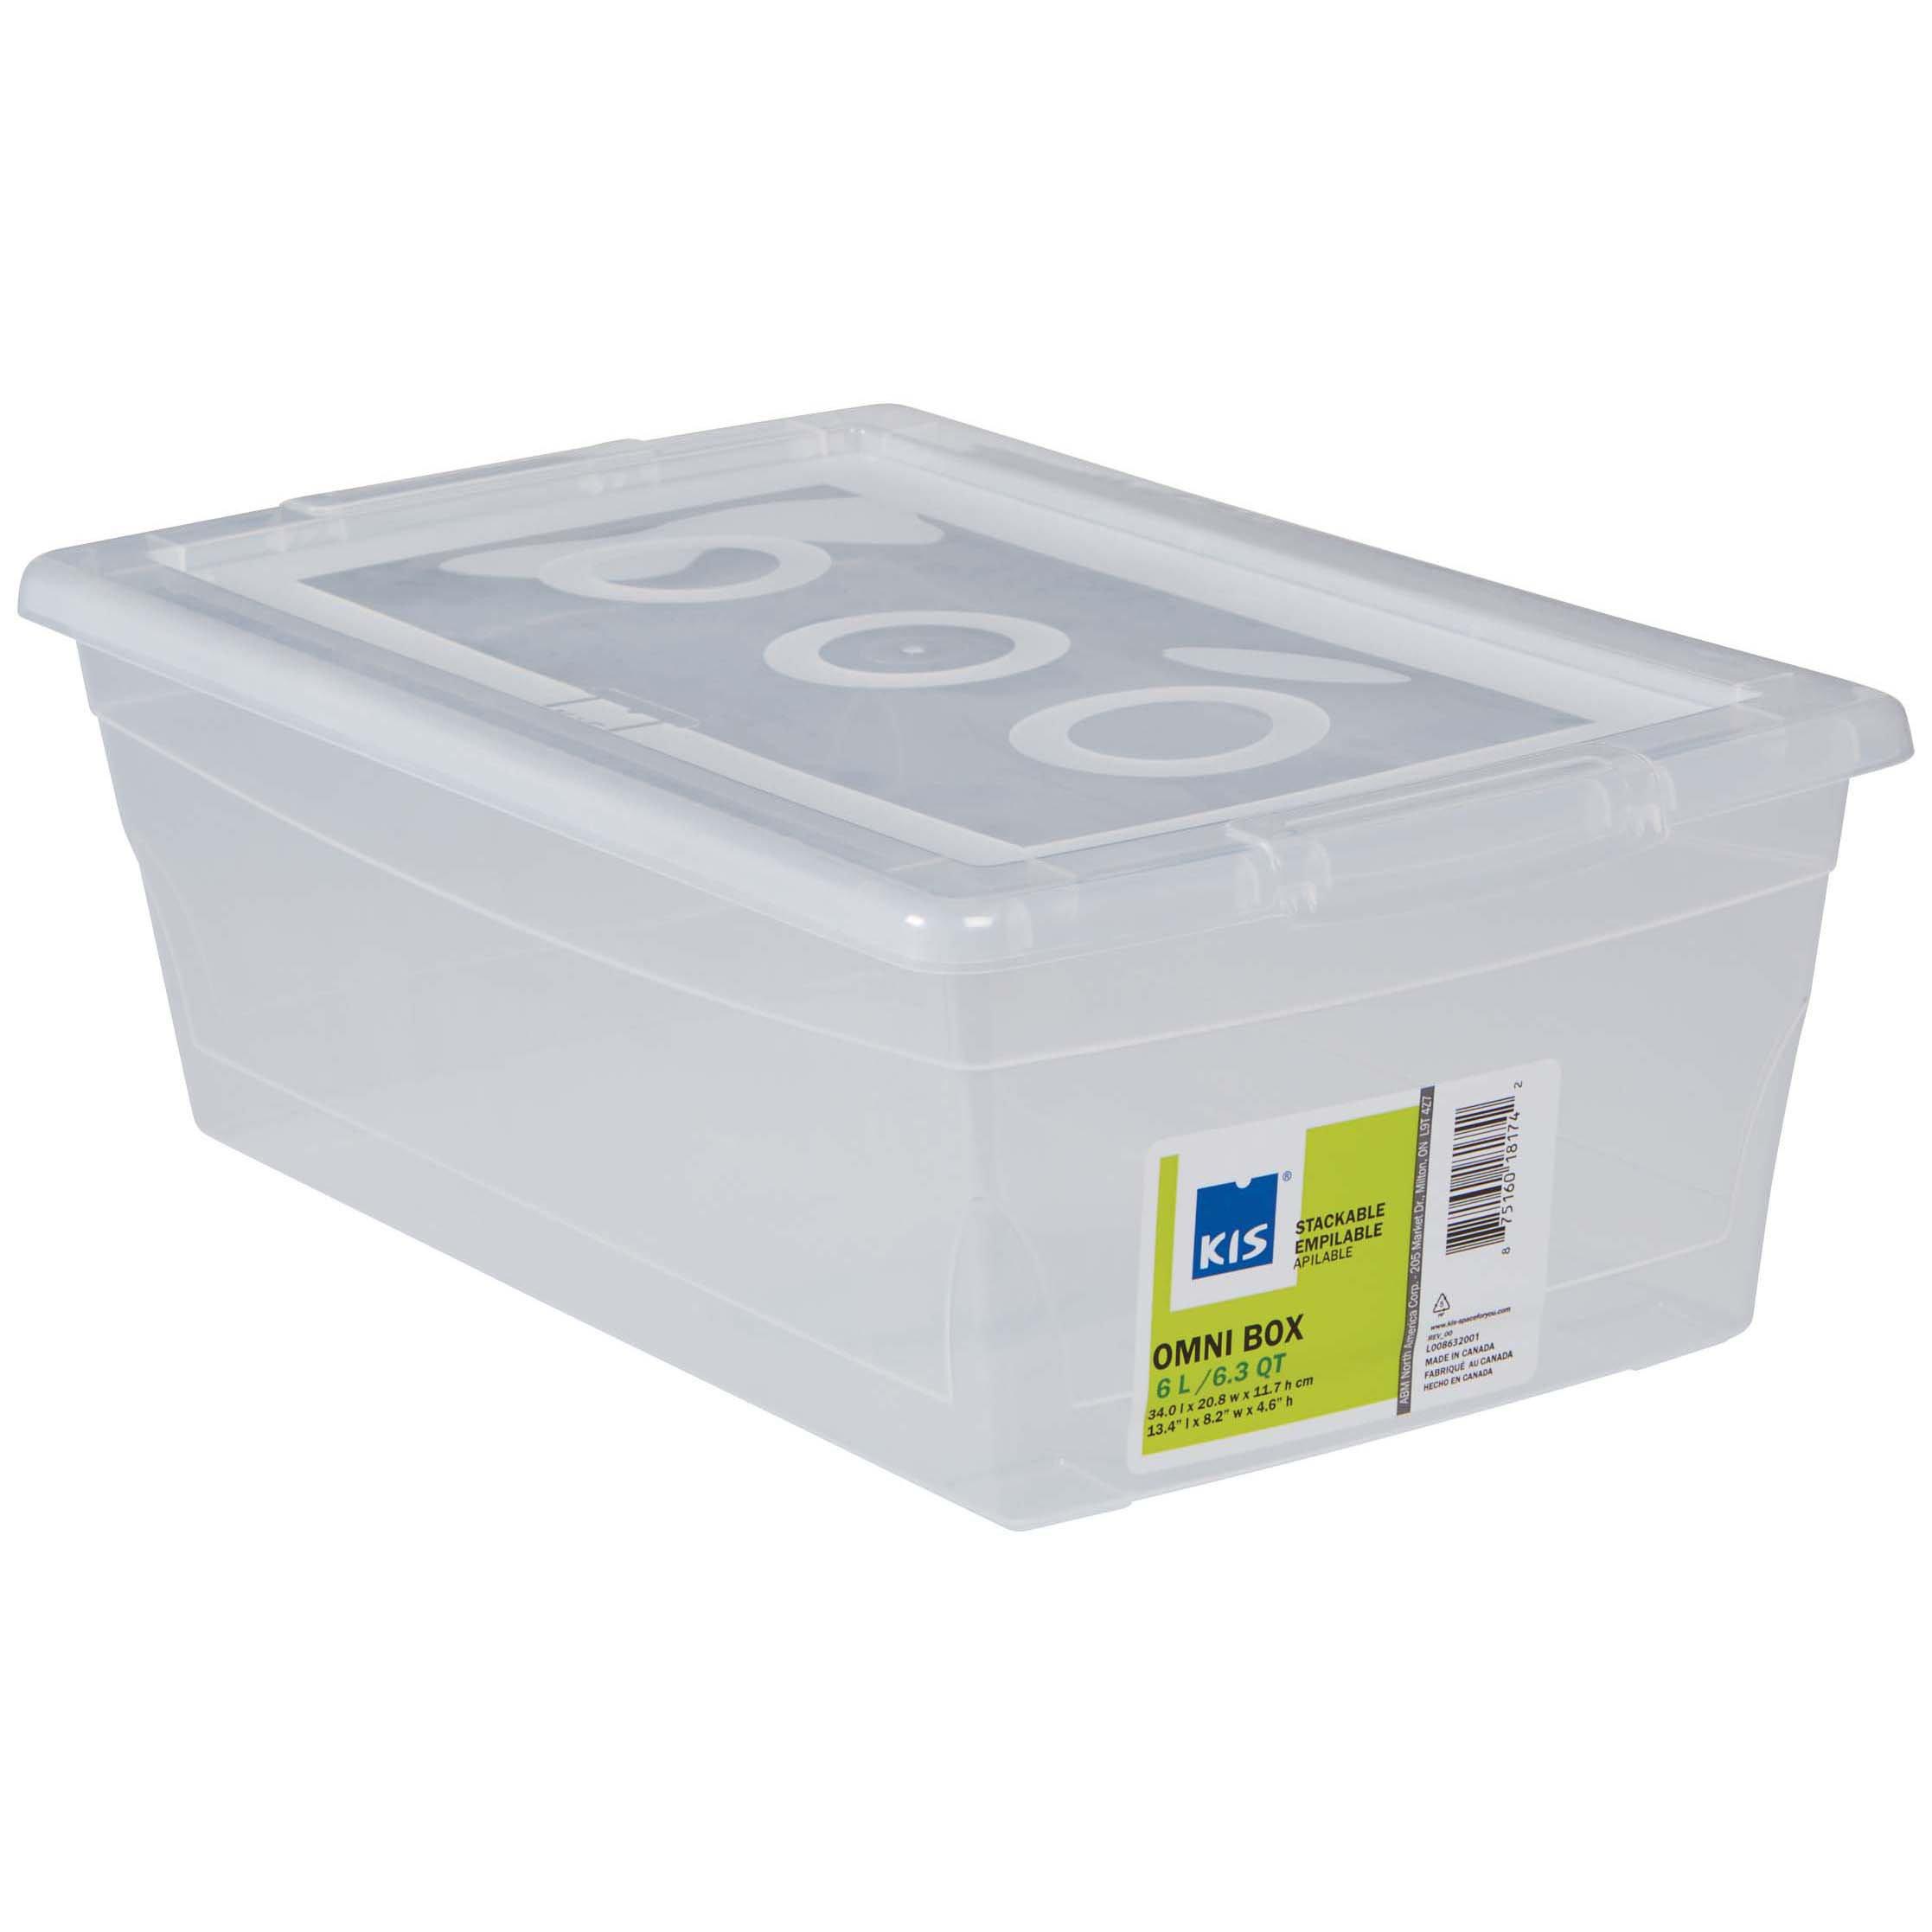 sc 1 st  HEB.com & Kis Omni Box Clear Shoe Box with Lid - Shop Closet Organization at HEB